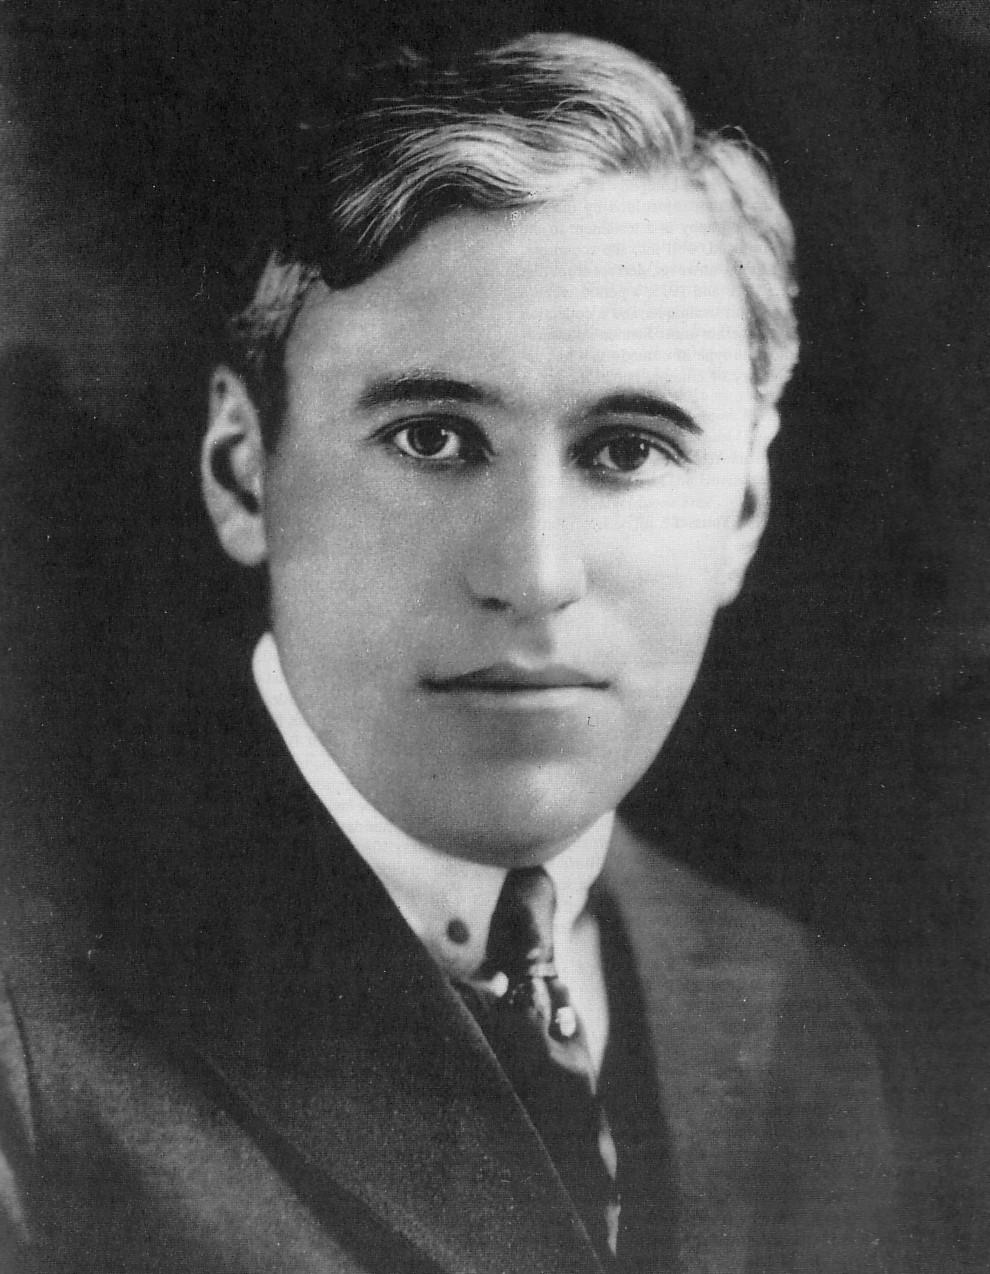 Charles-Chaplin-7